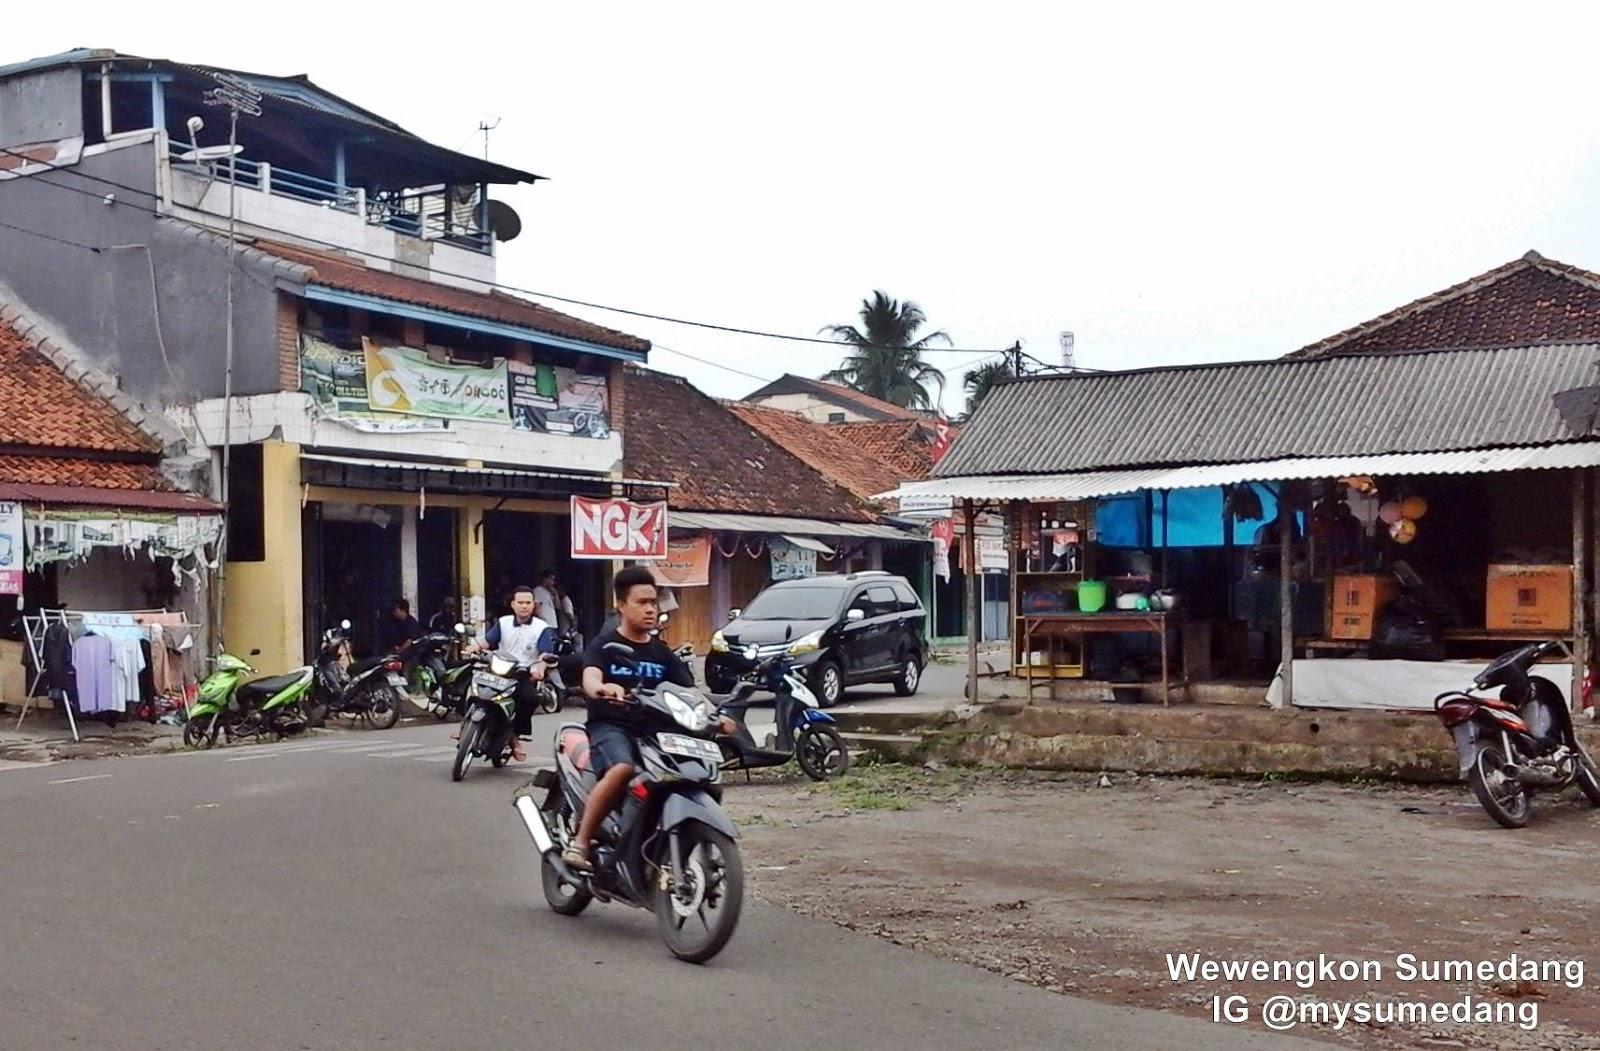 Tentang Keunikan, Tradisi, & Pamali di Dusun Malandang Sumedang